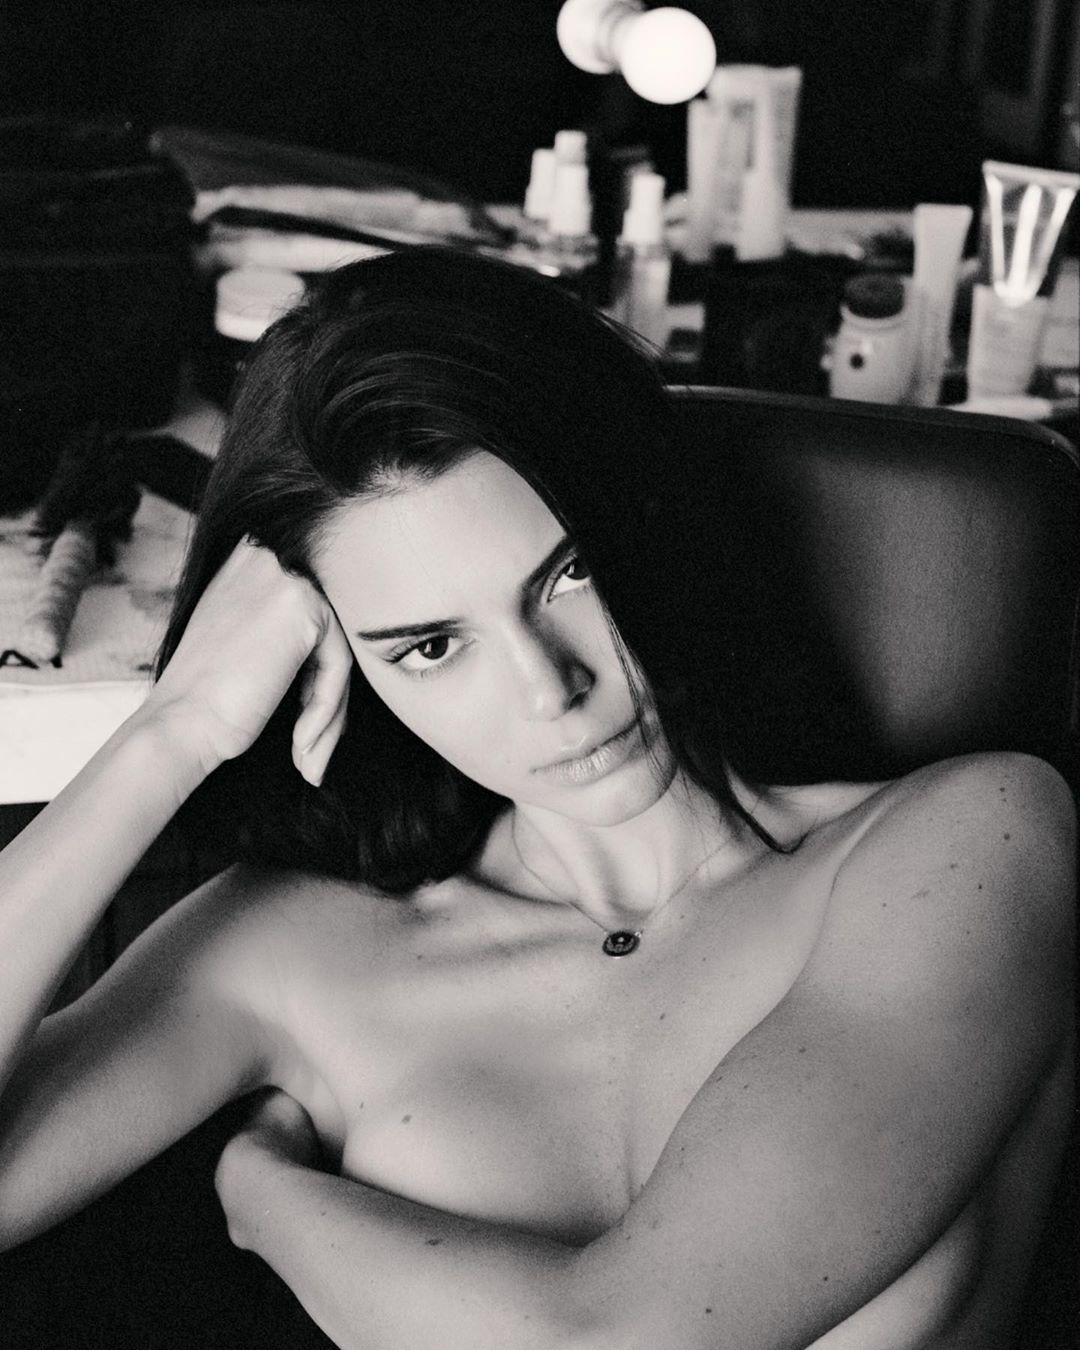 Kendall Jenner poses nude for Mert Alas